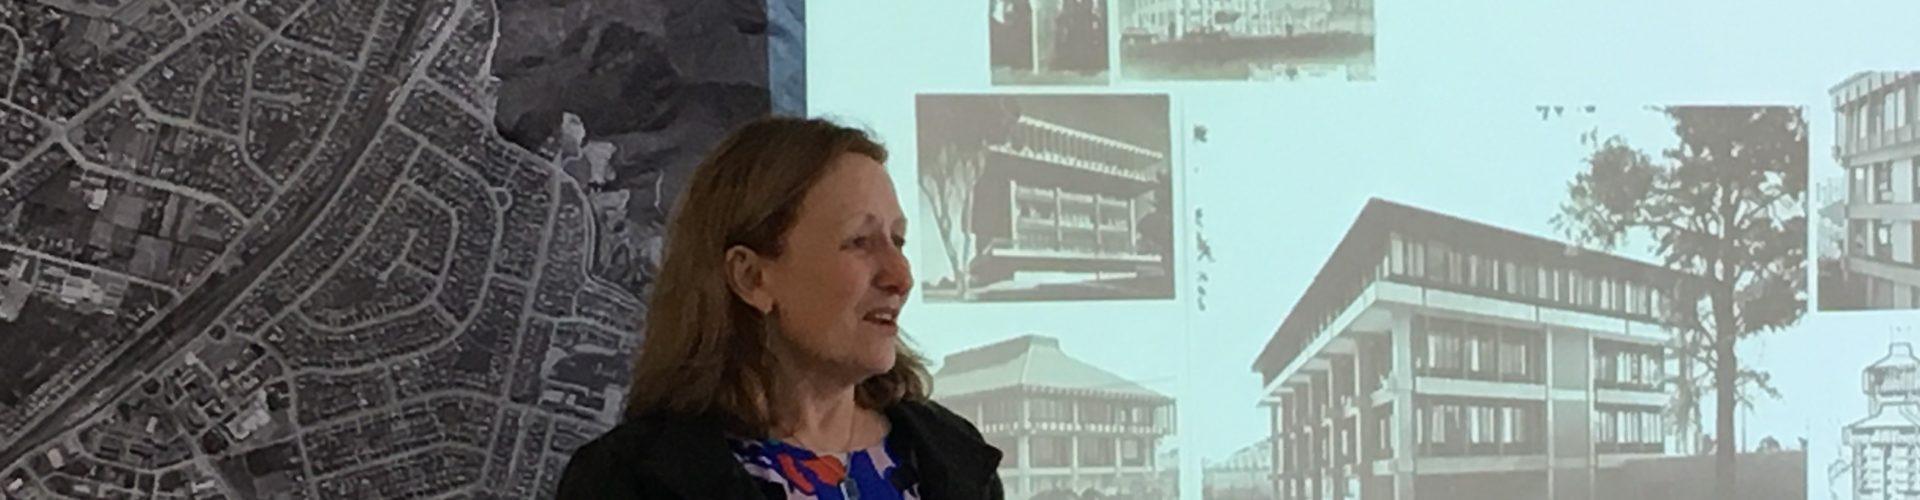 City Archivist Jennie Henton